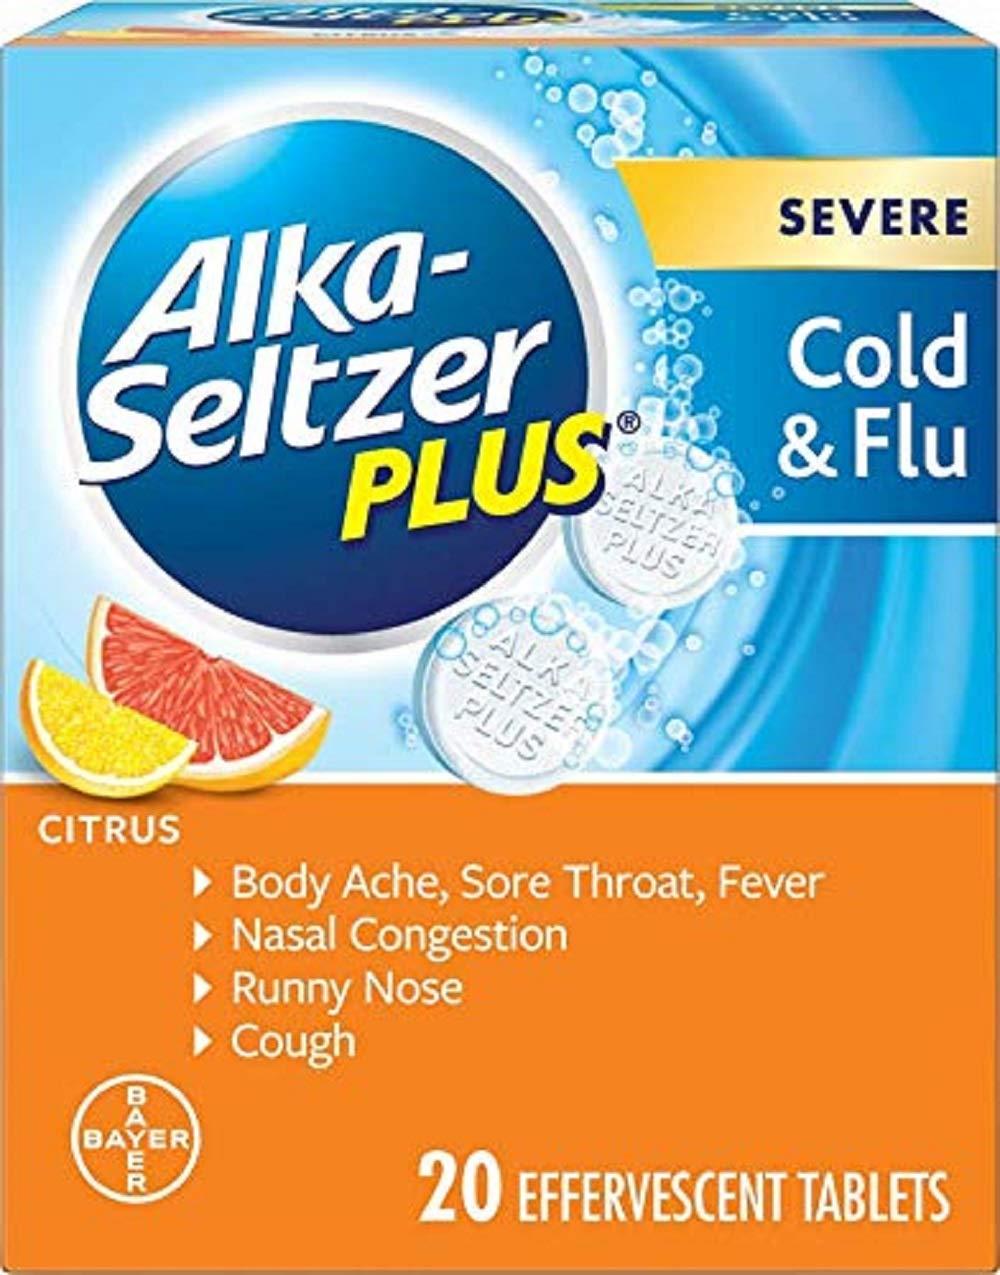 Alka-Seltzer Plus Severe Cold & Flu Effervescent, Citrus, 20 Count